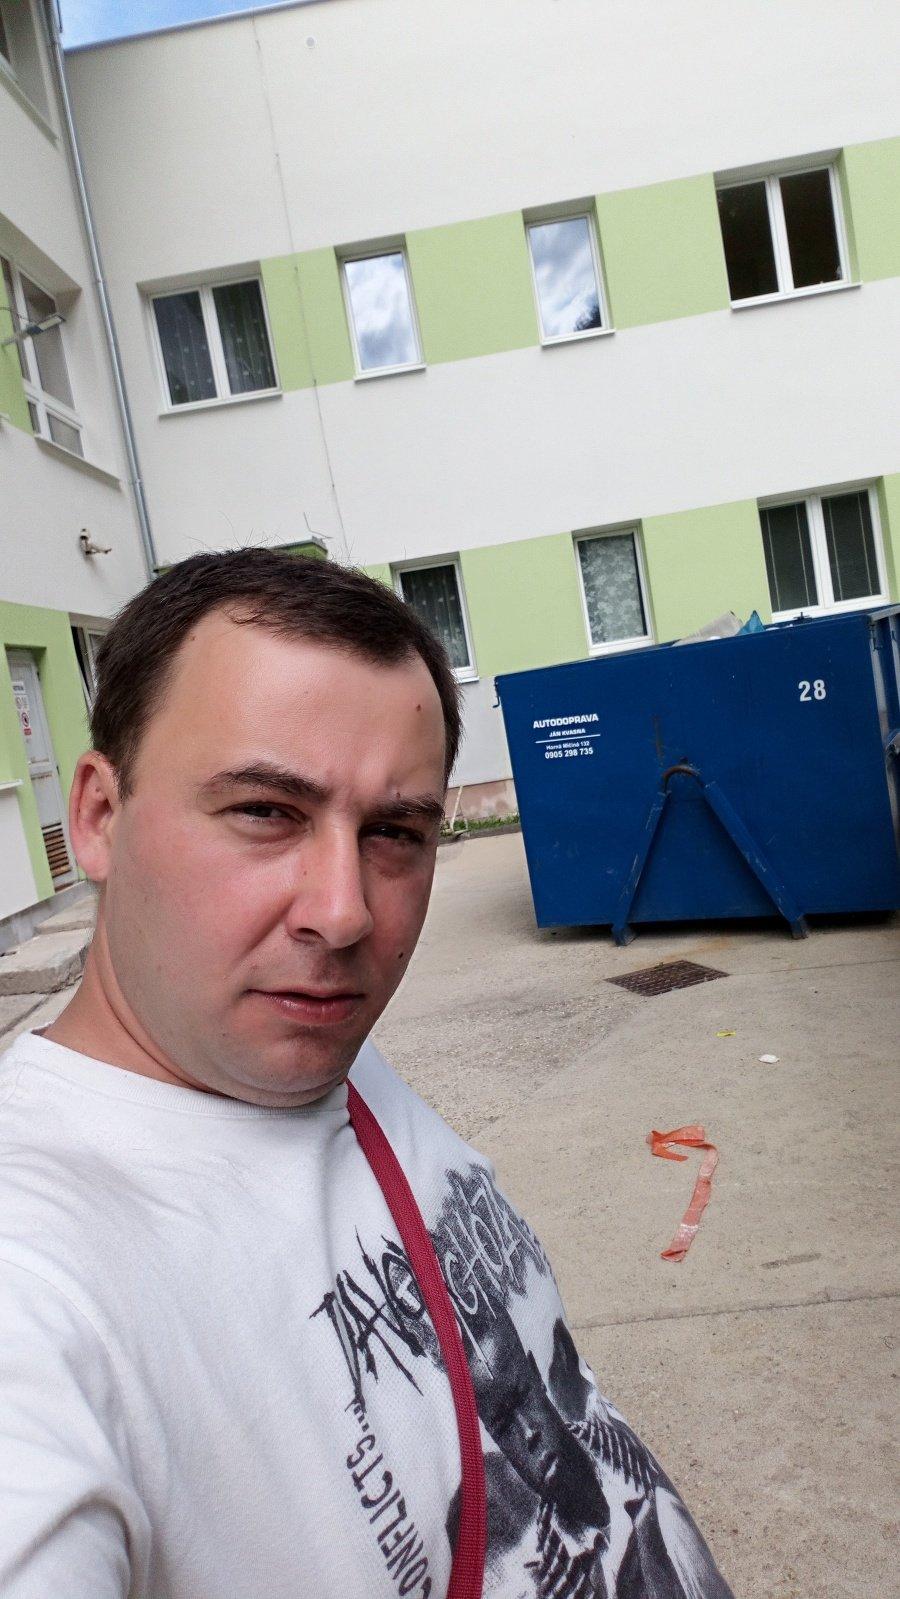 Milan Rusnak